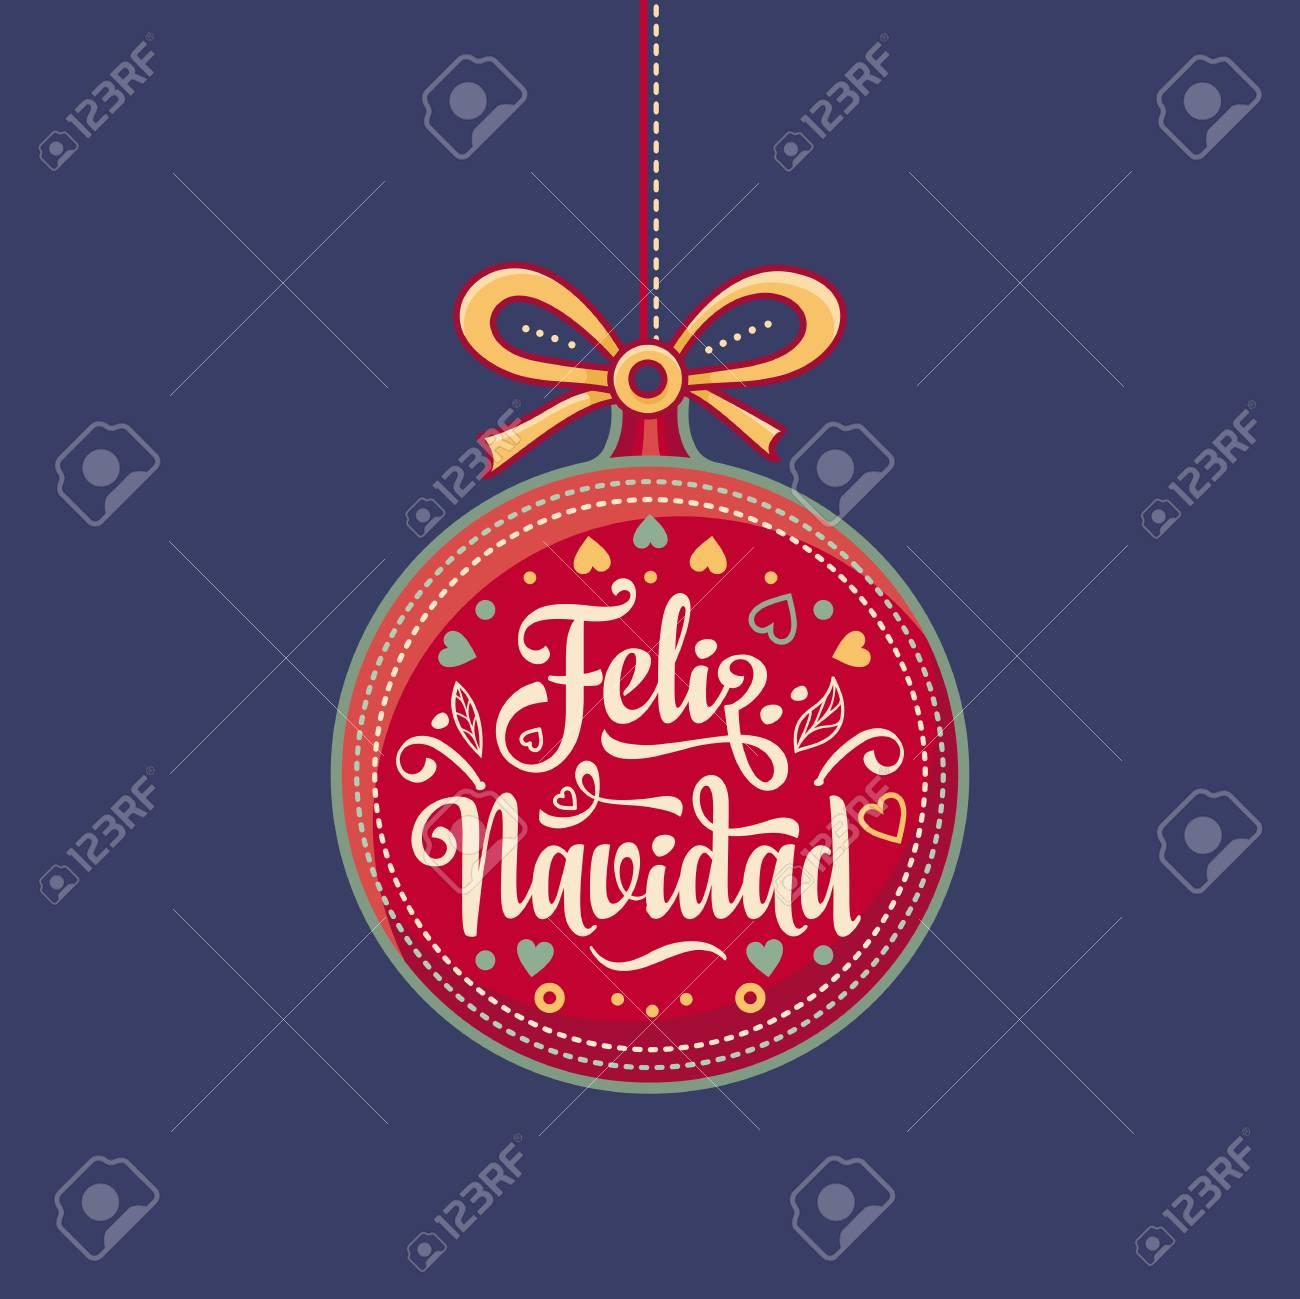 Feliz Navidad - Christmas Card On Spanish Language. Royalty Free ...